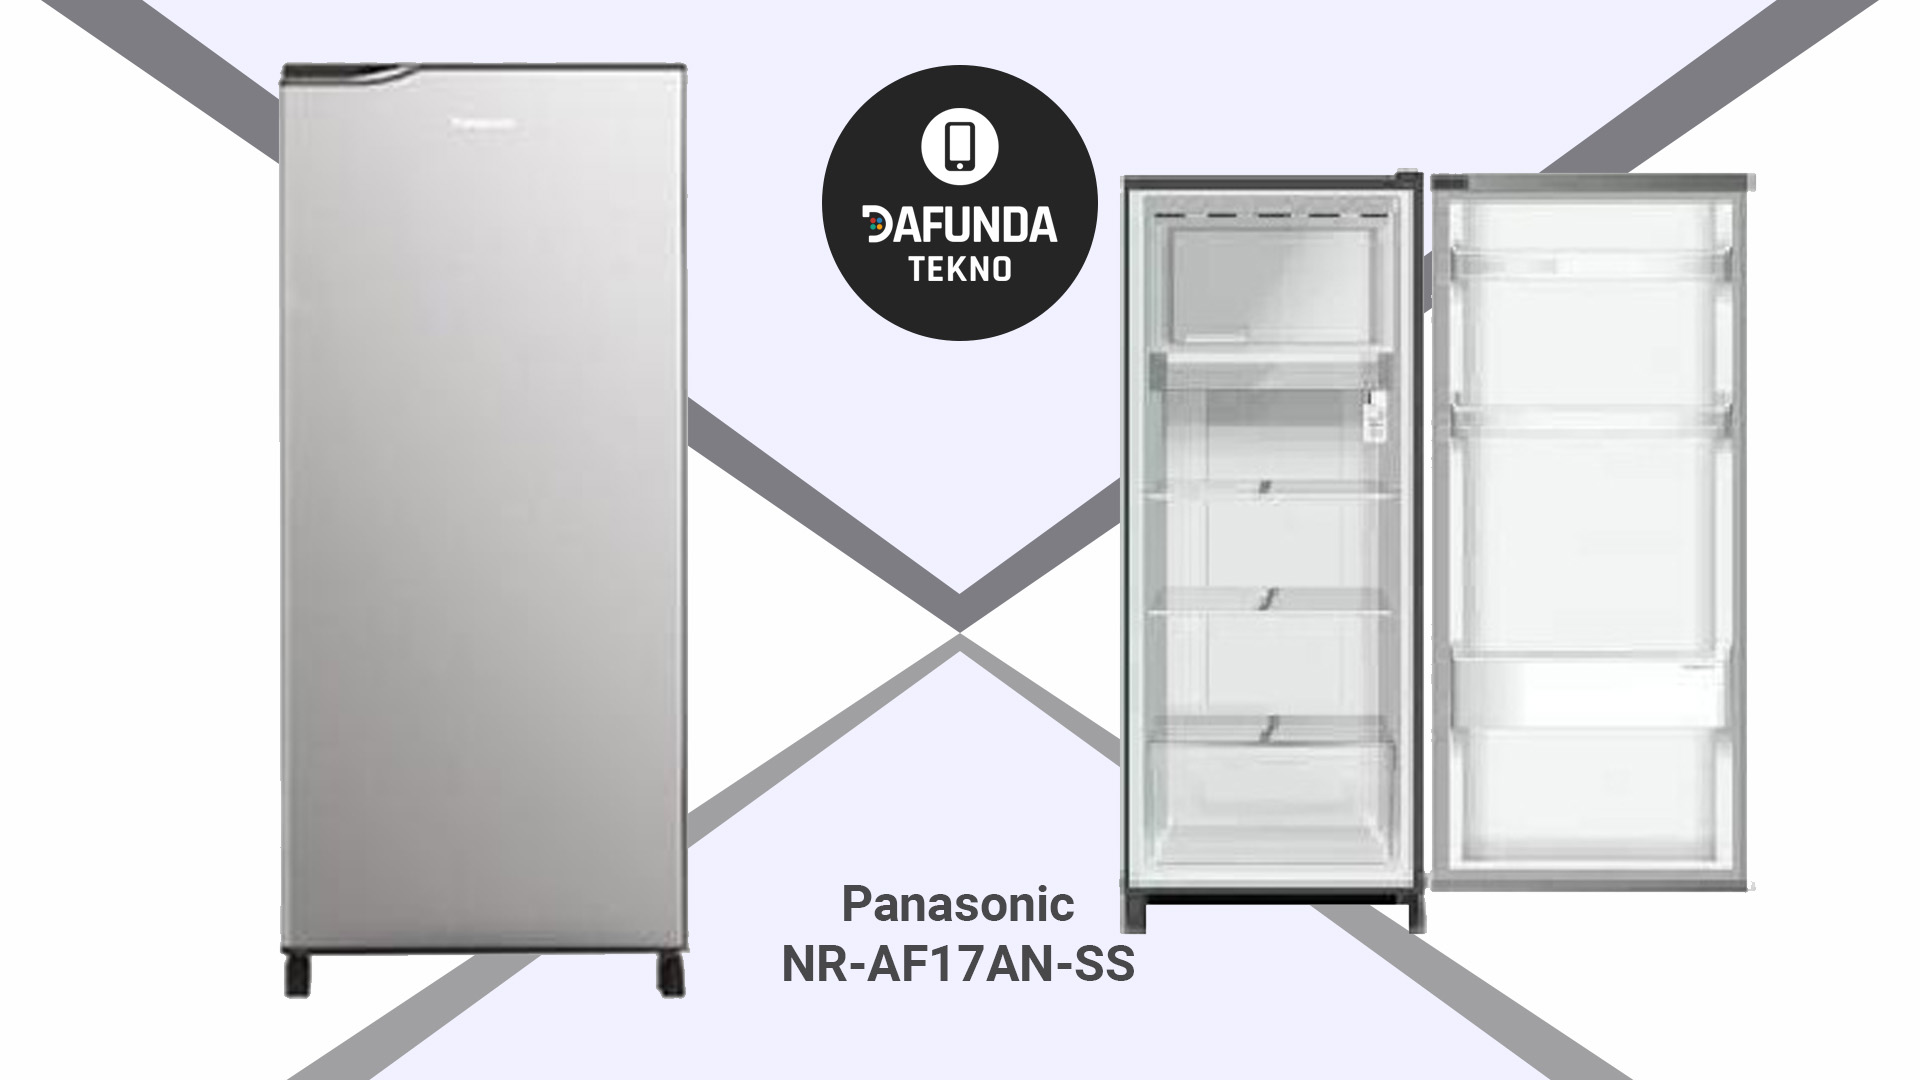 Panasonic Nr Af17an Ss